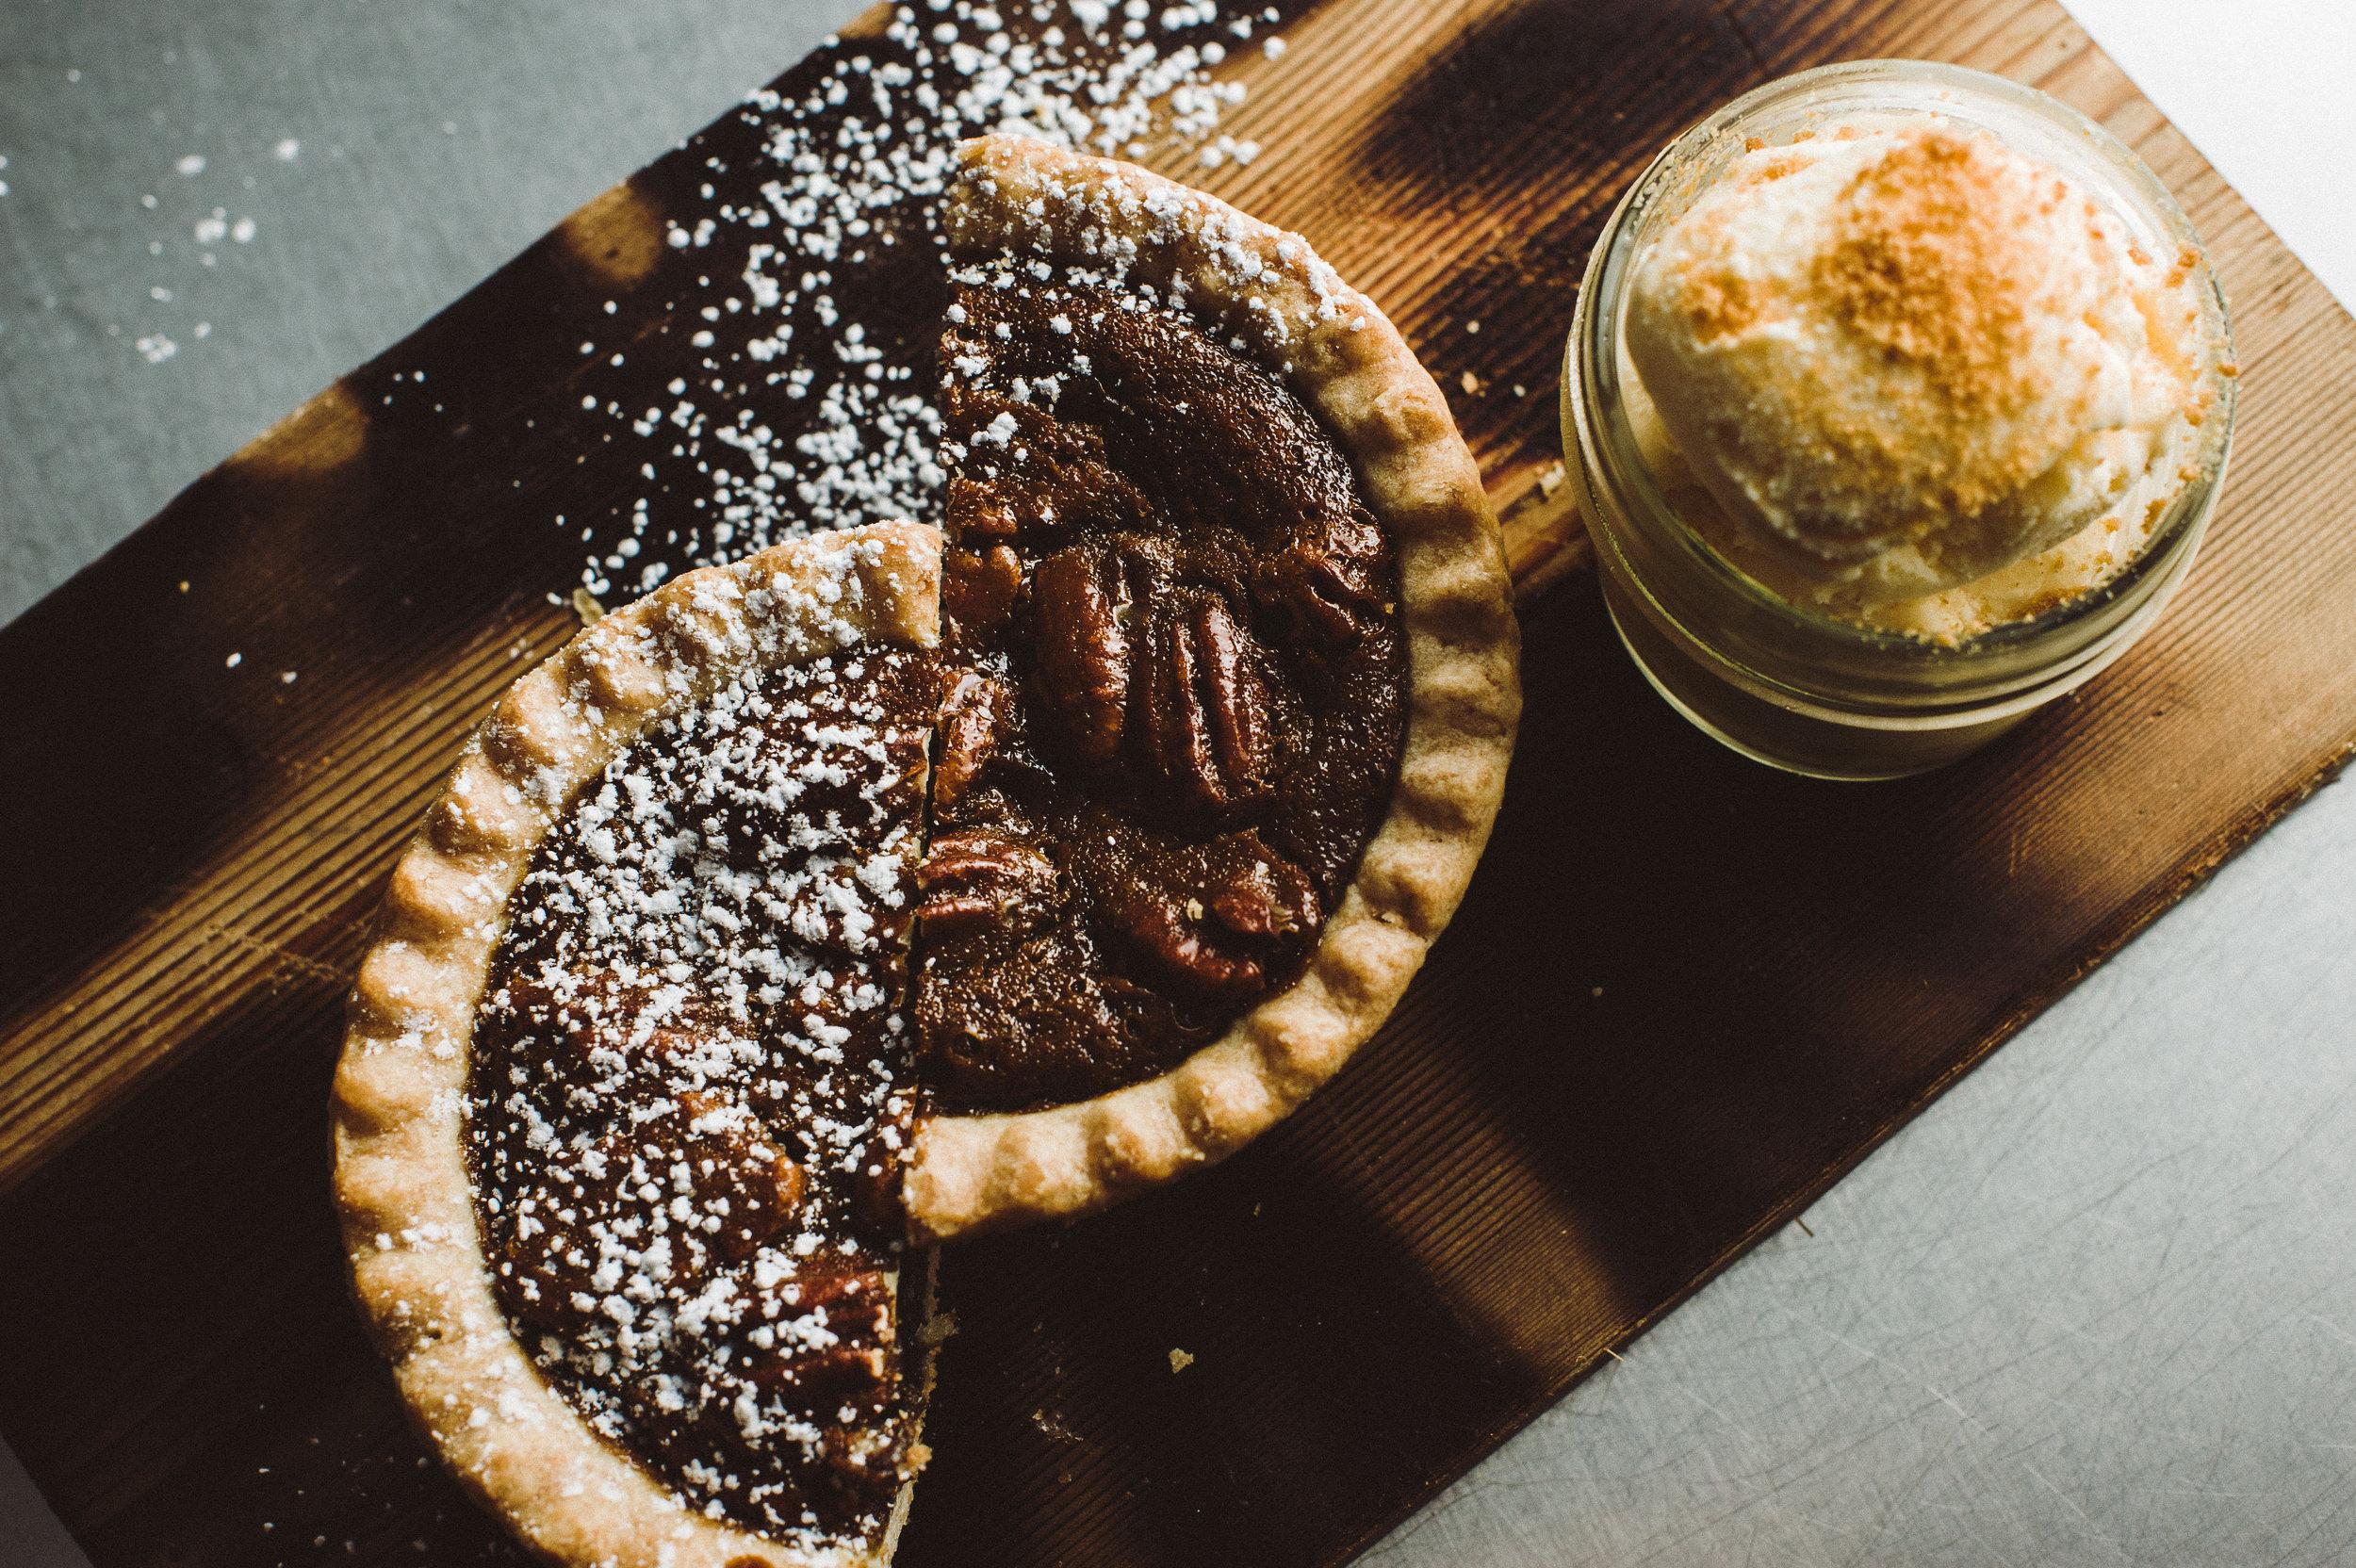 gilberts-pecan-pie.jpg